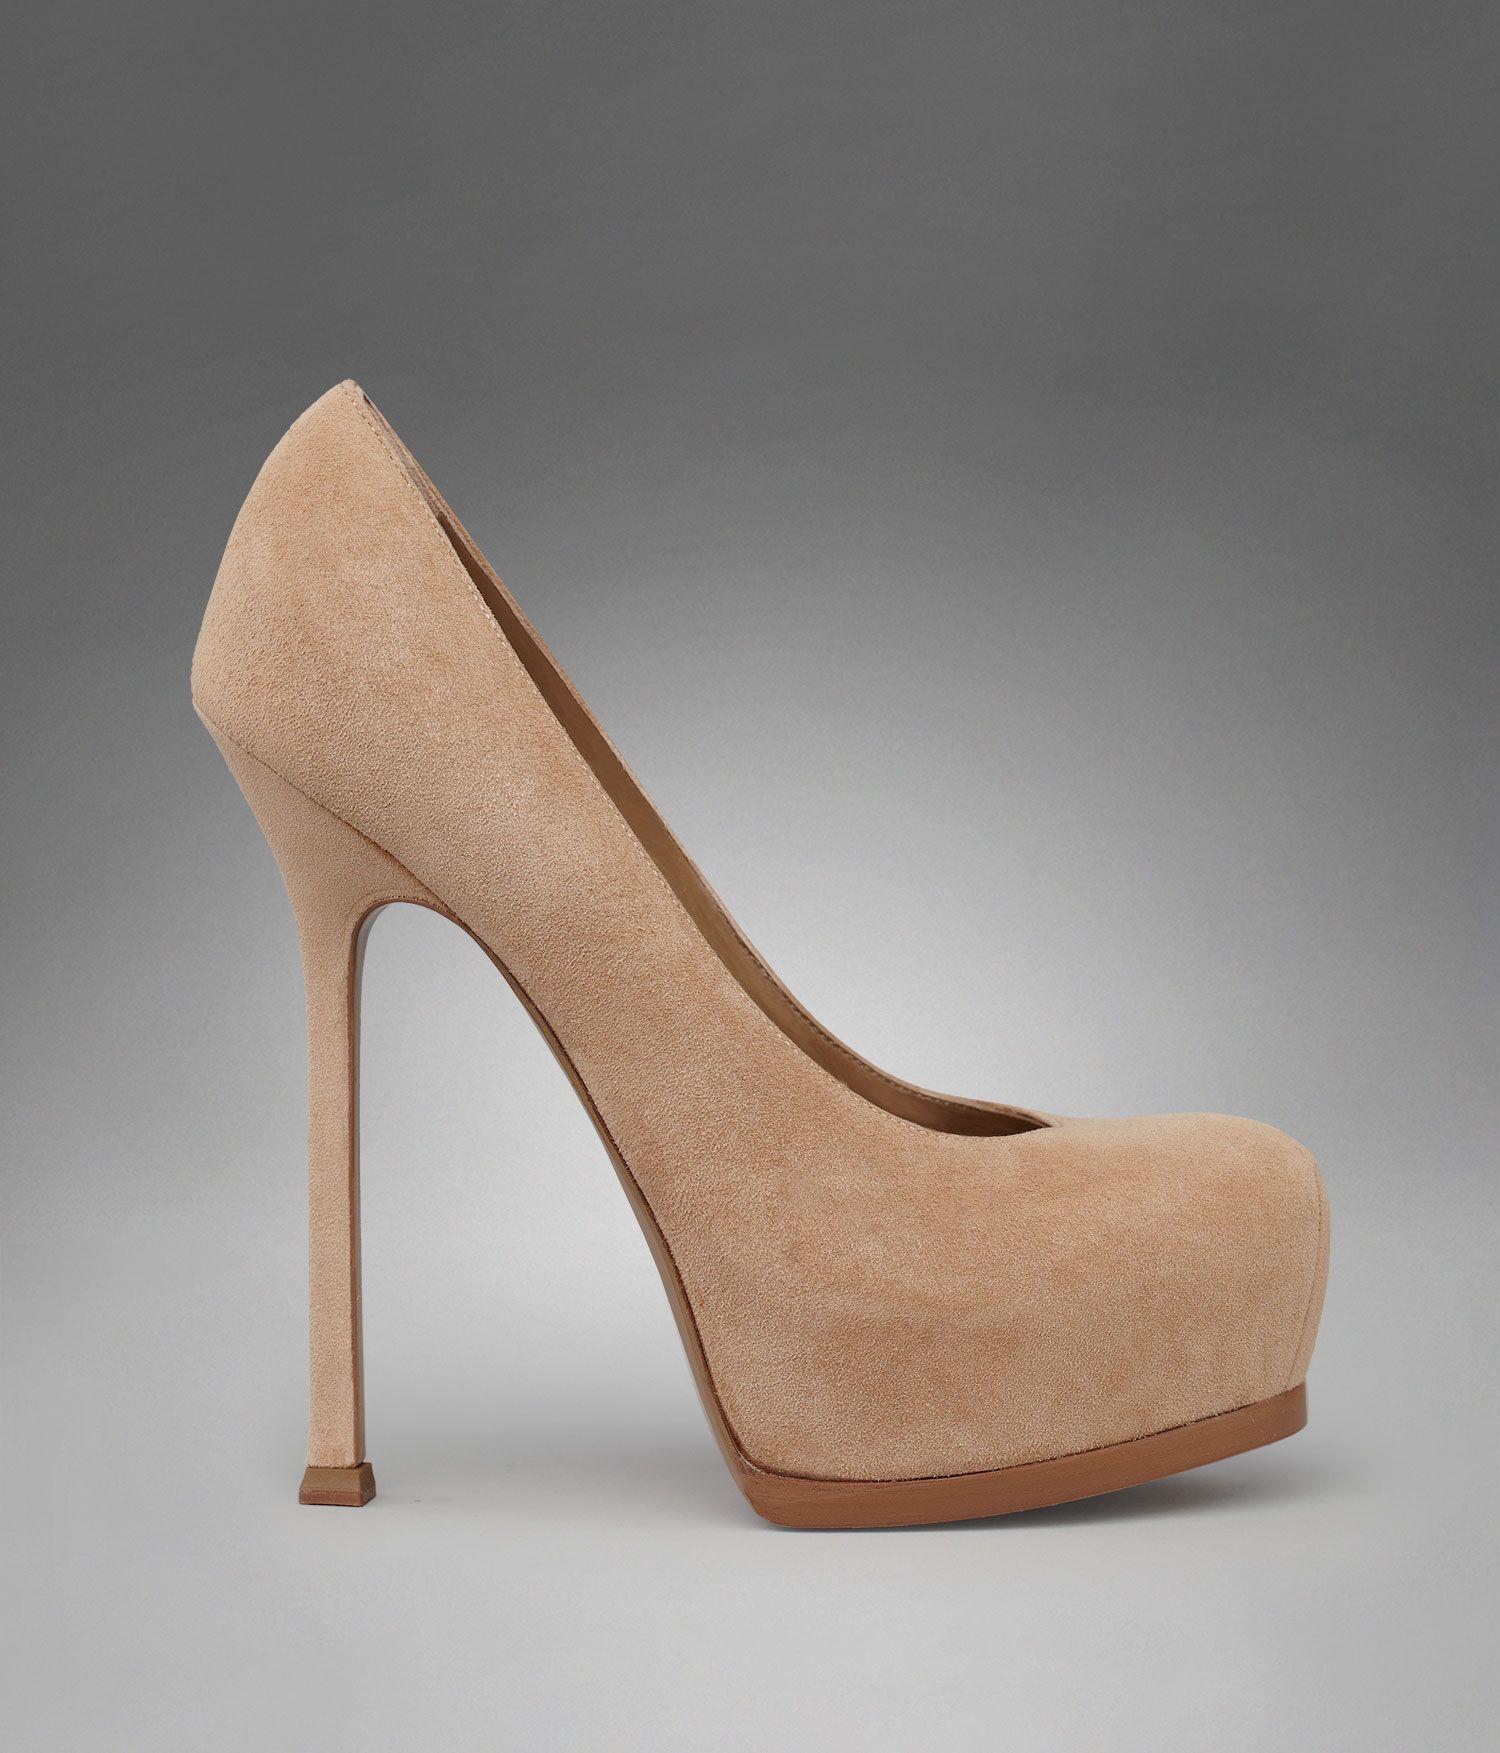 00c9ab404b6 YSL TRIB TOO HIGH HEEL PUMP IN BEIGE SUEDE | Shoesss!!! | Shoes, Ysl ...